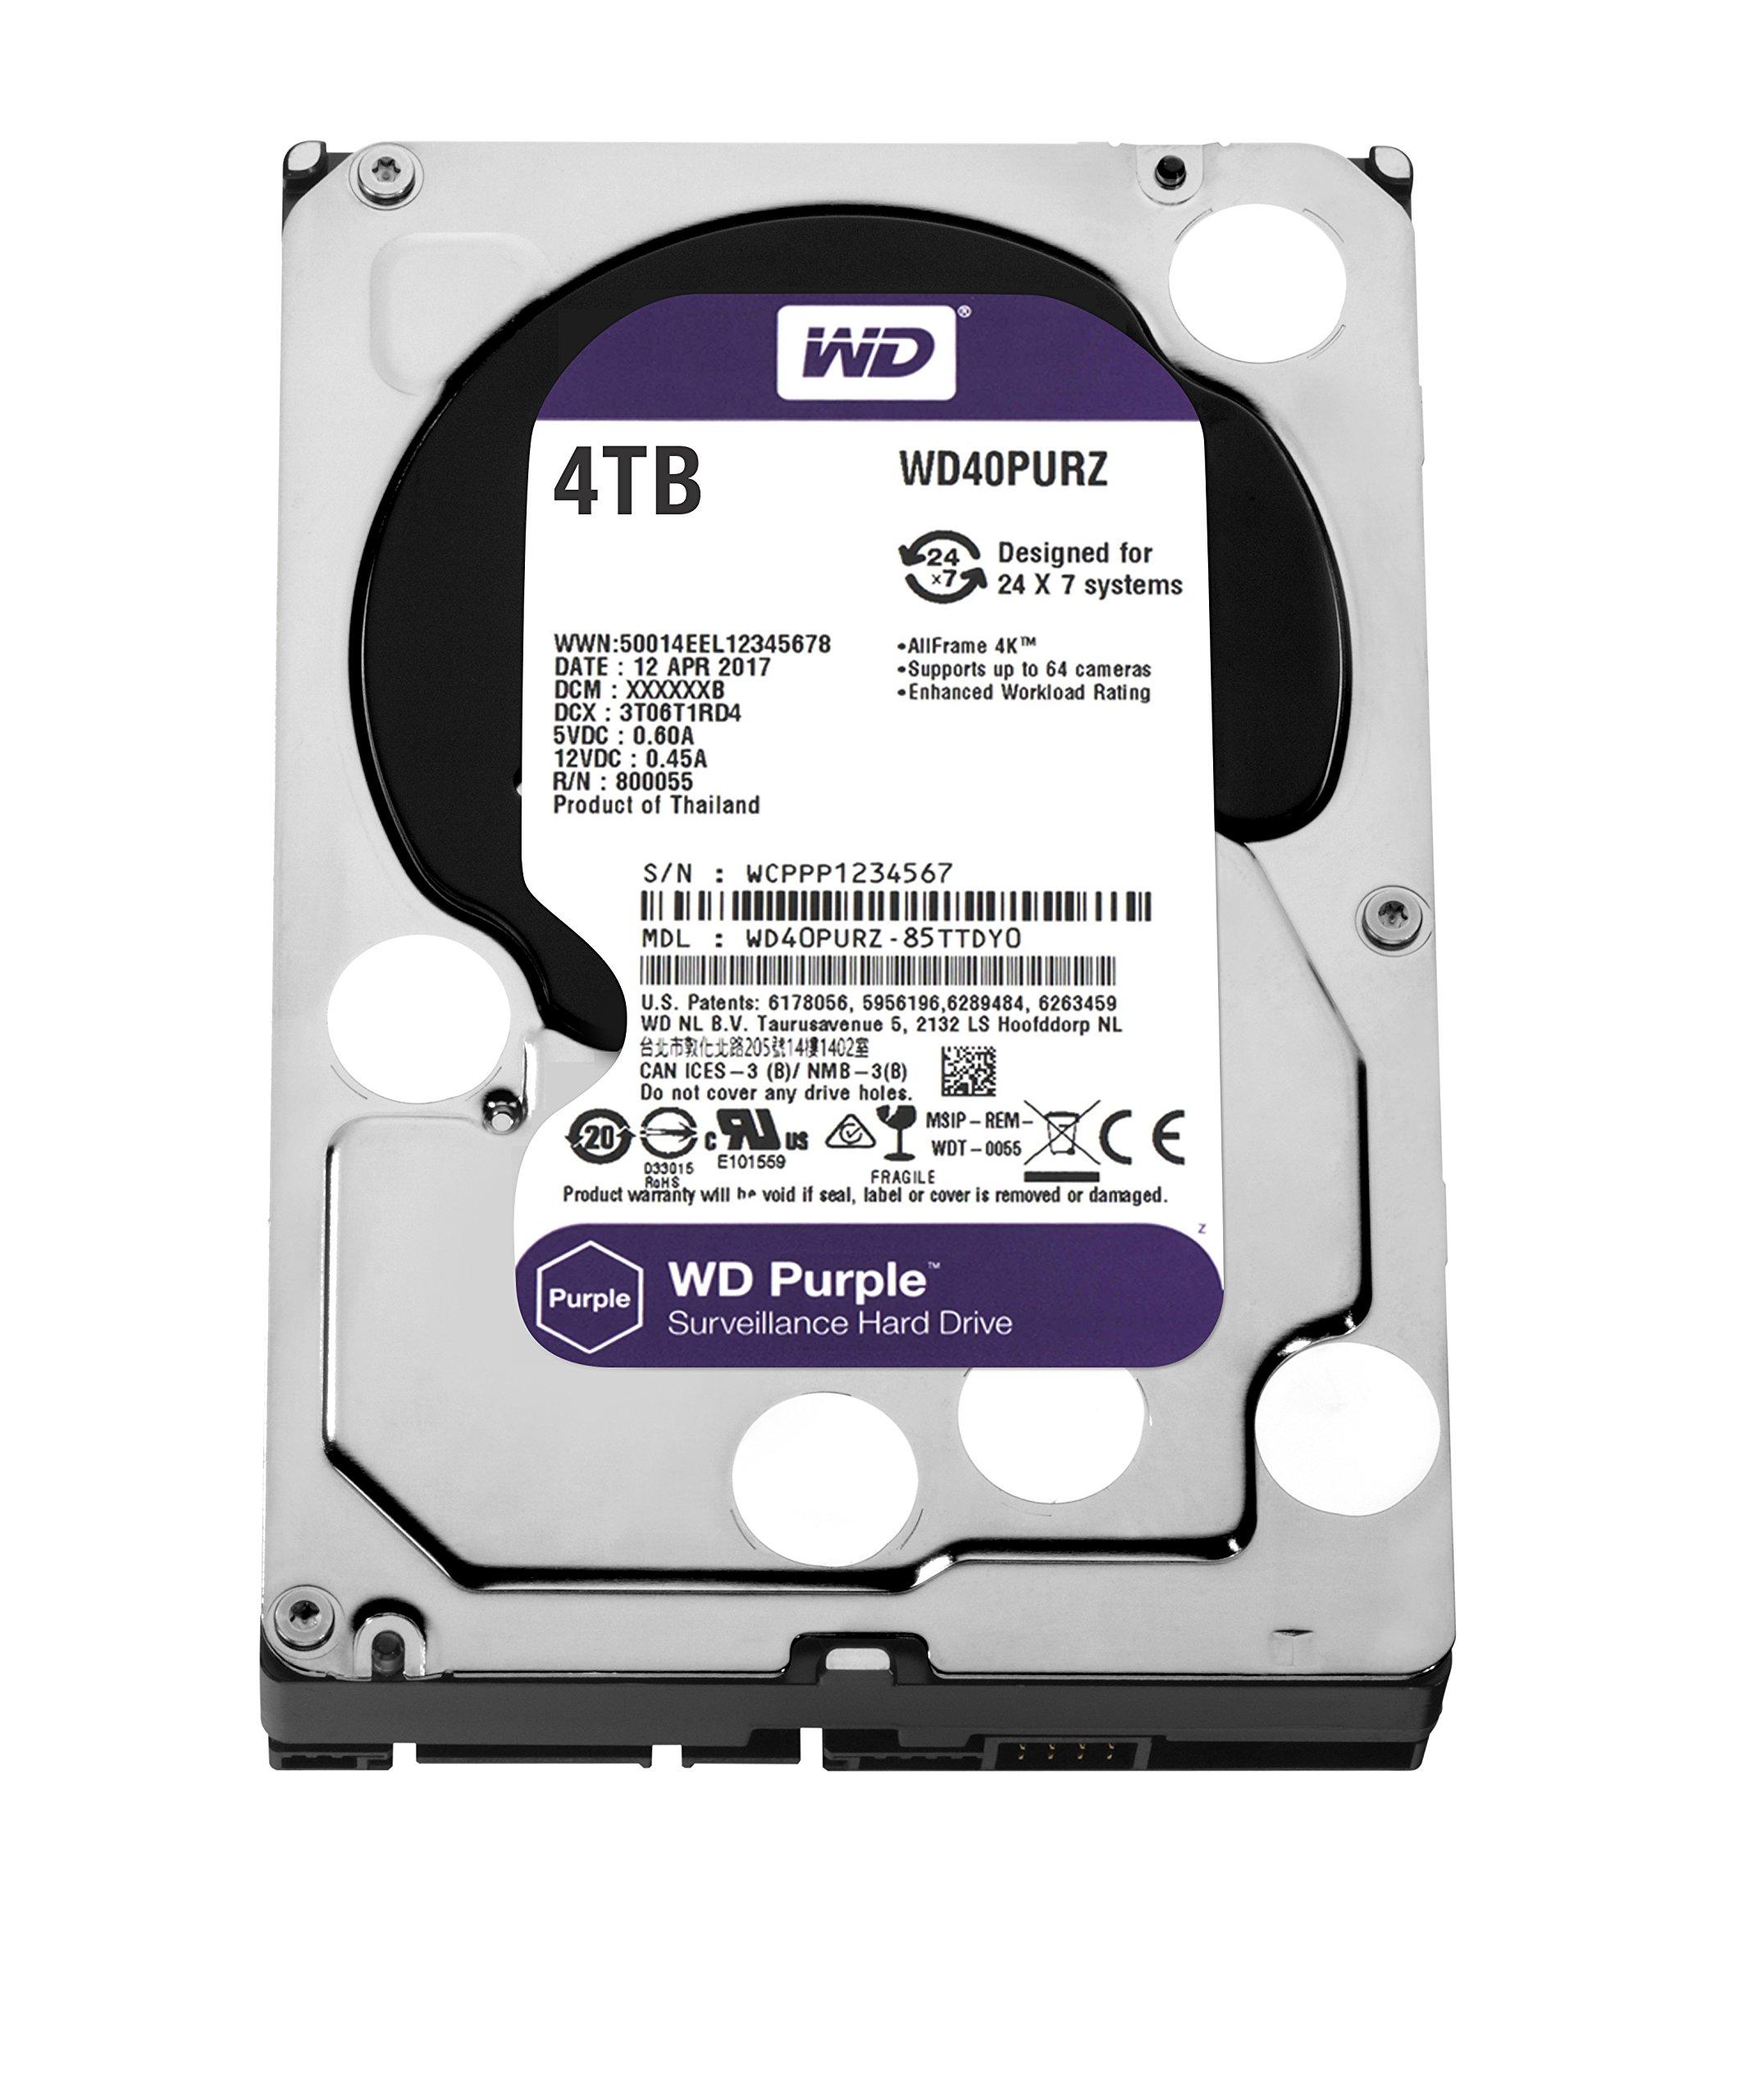 WD Purple 4TB Surveillance Hard Disk Drive - 5400 RPM Class SATA 6 Gb/s 64MB Cache 3.5 Inch - WD40PURZ by Western Digital